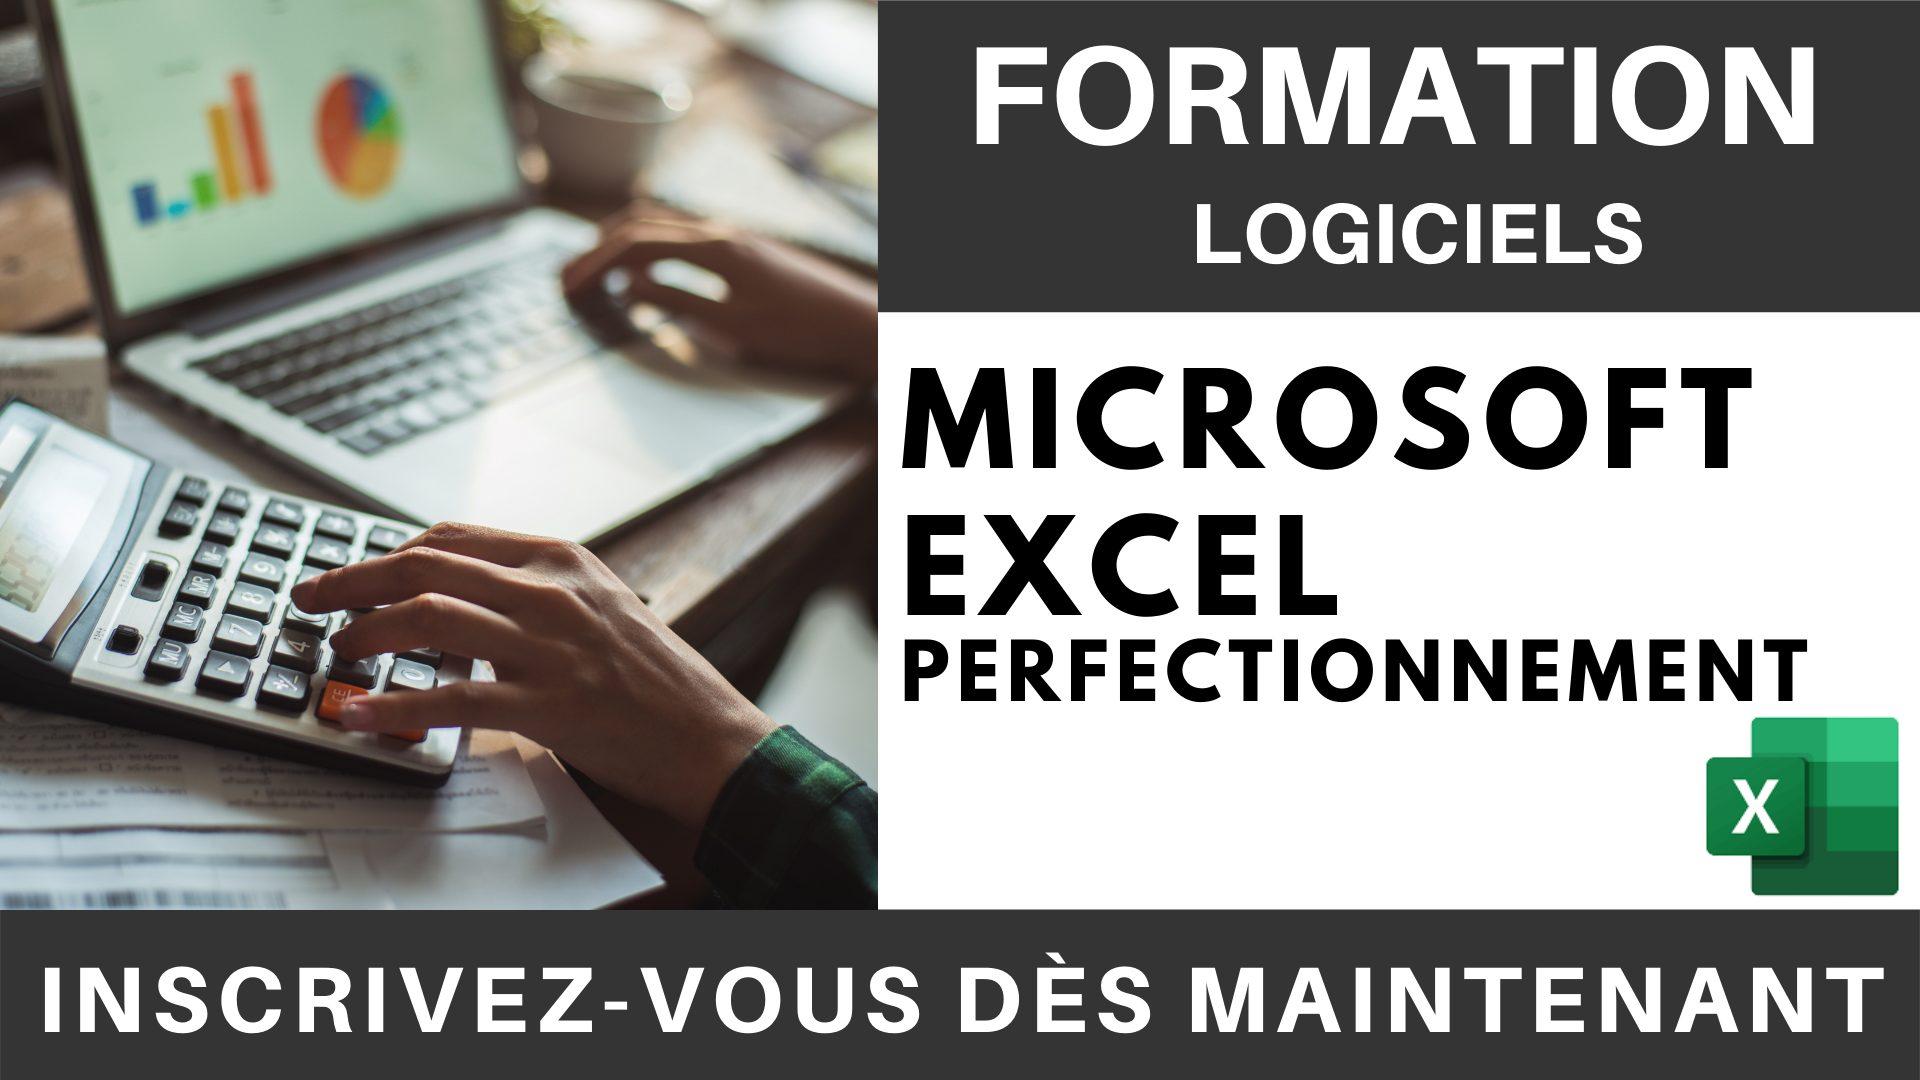 Formation LOGICIEL - Microsoft Excel Perfectionnement